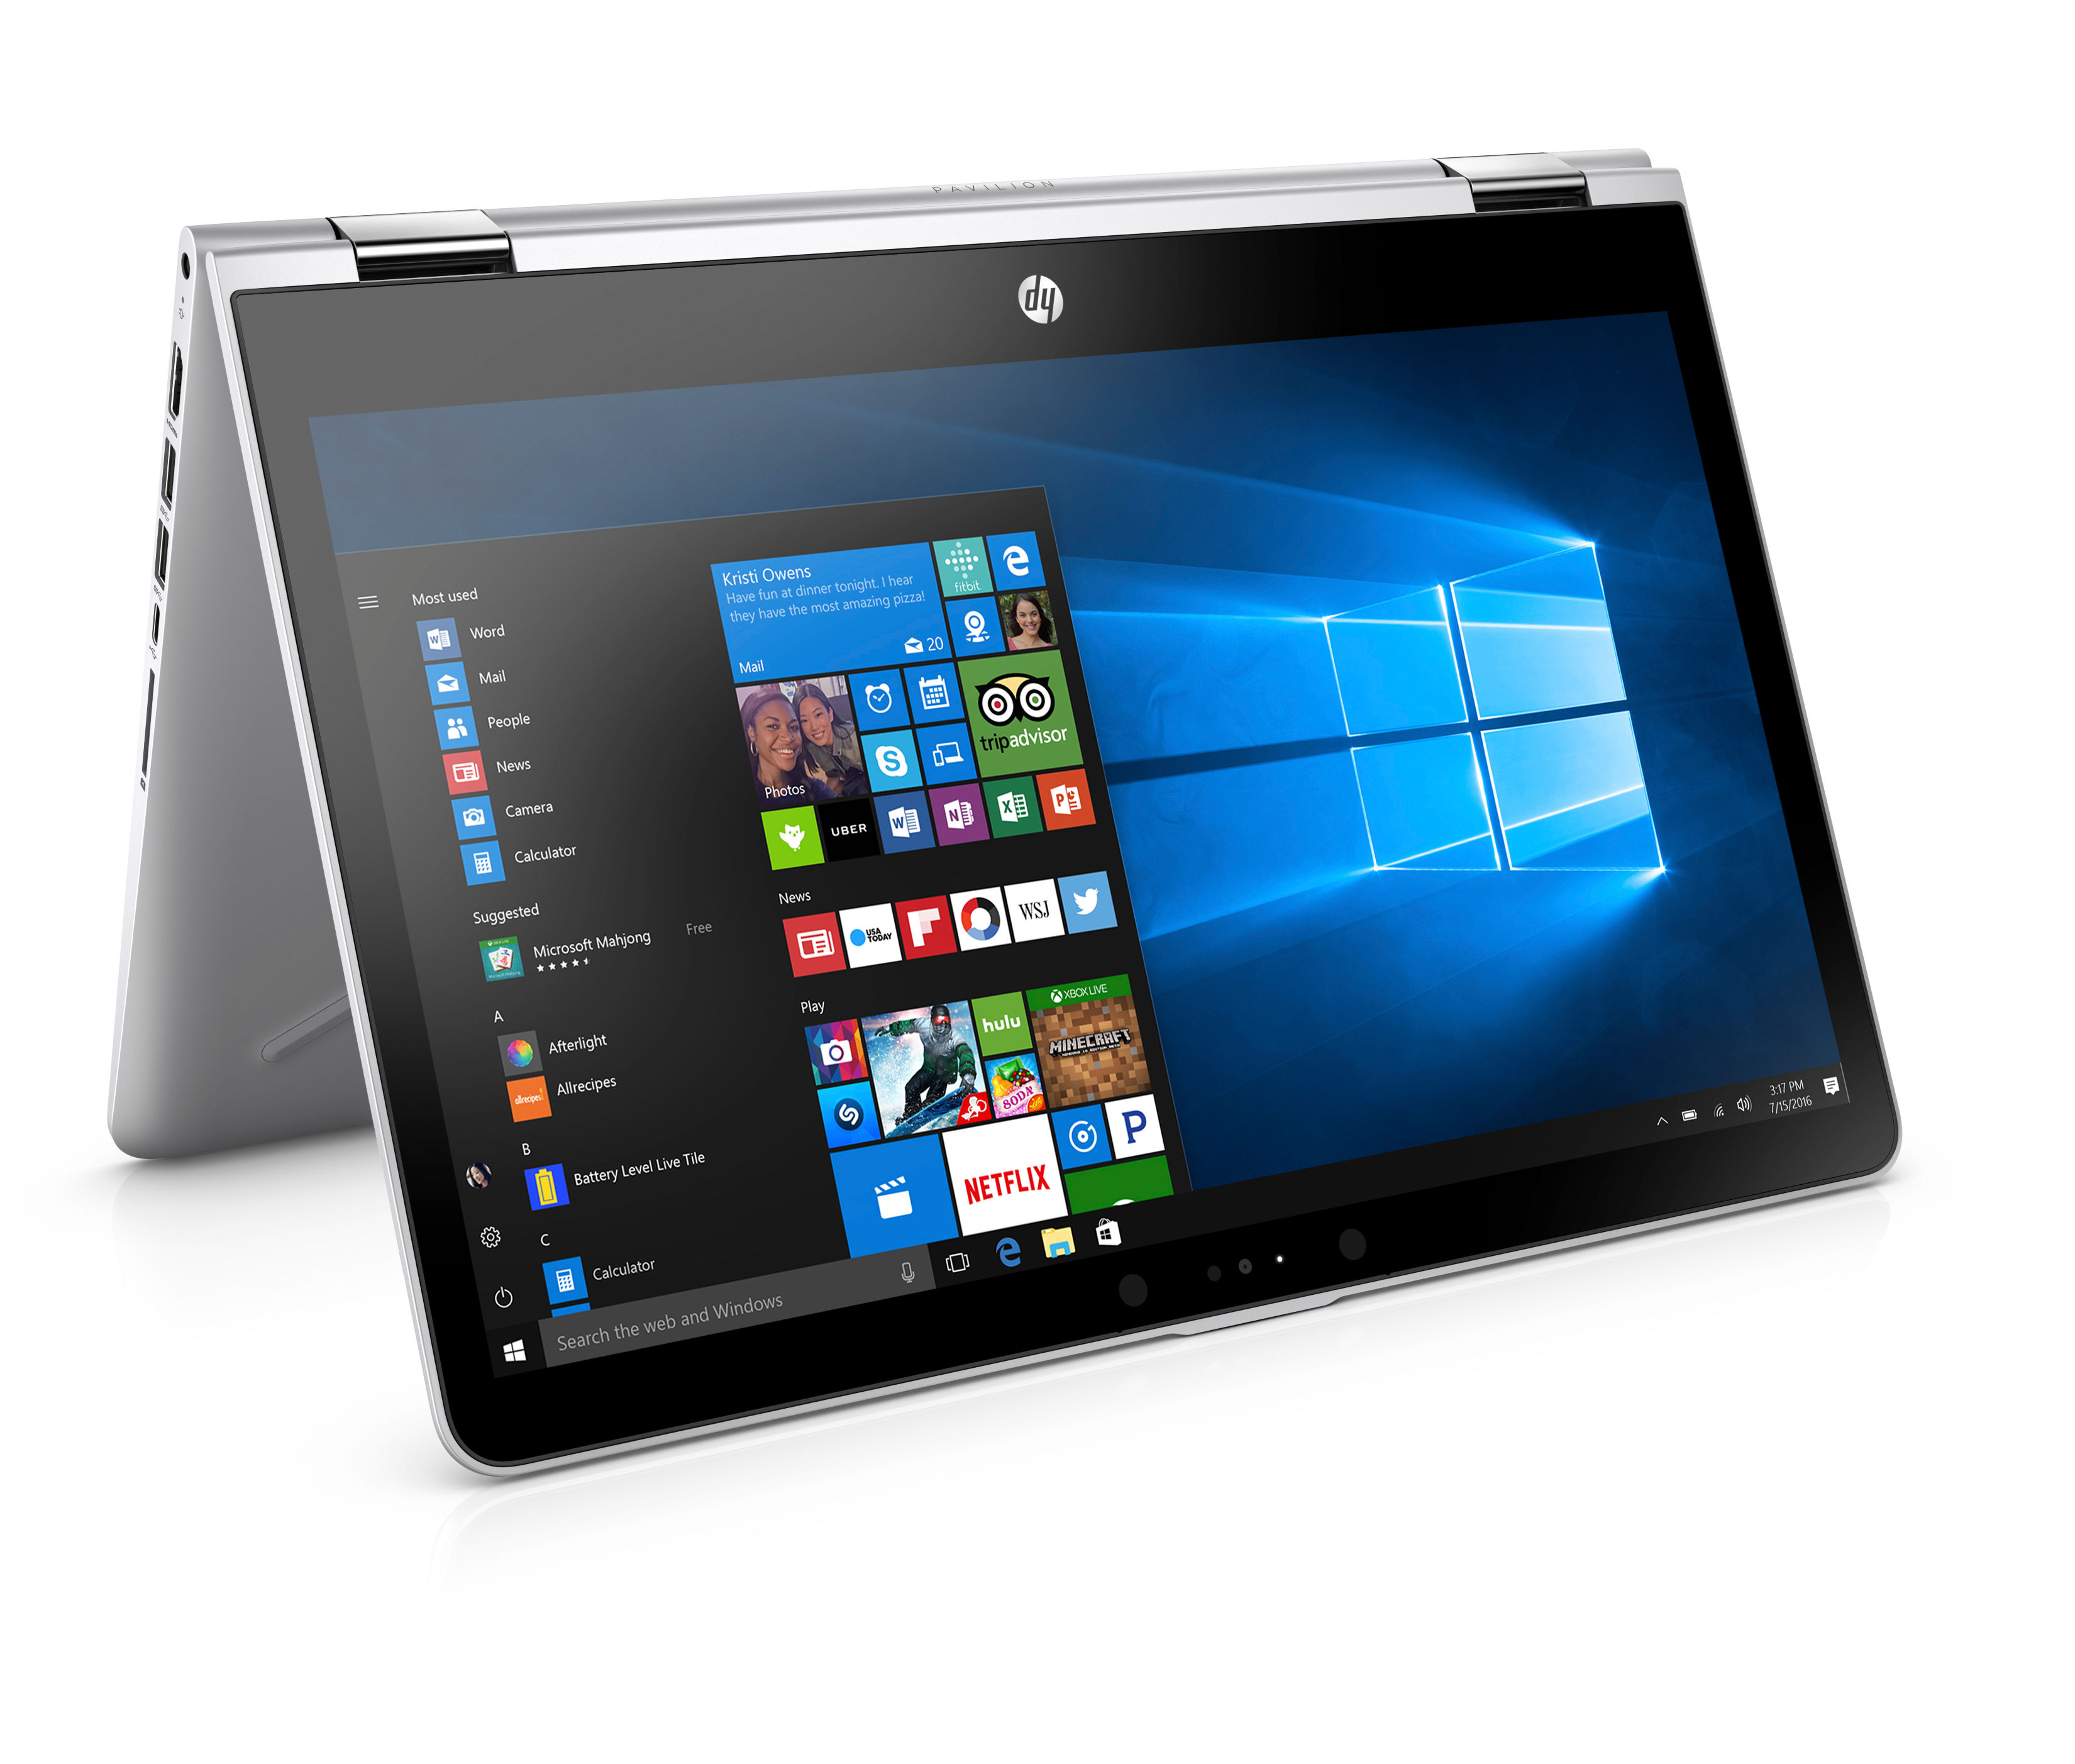 HP Pavilion x360: Stifte raus – Diktat!